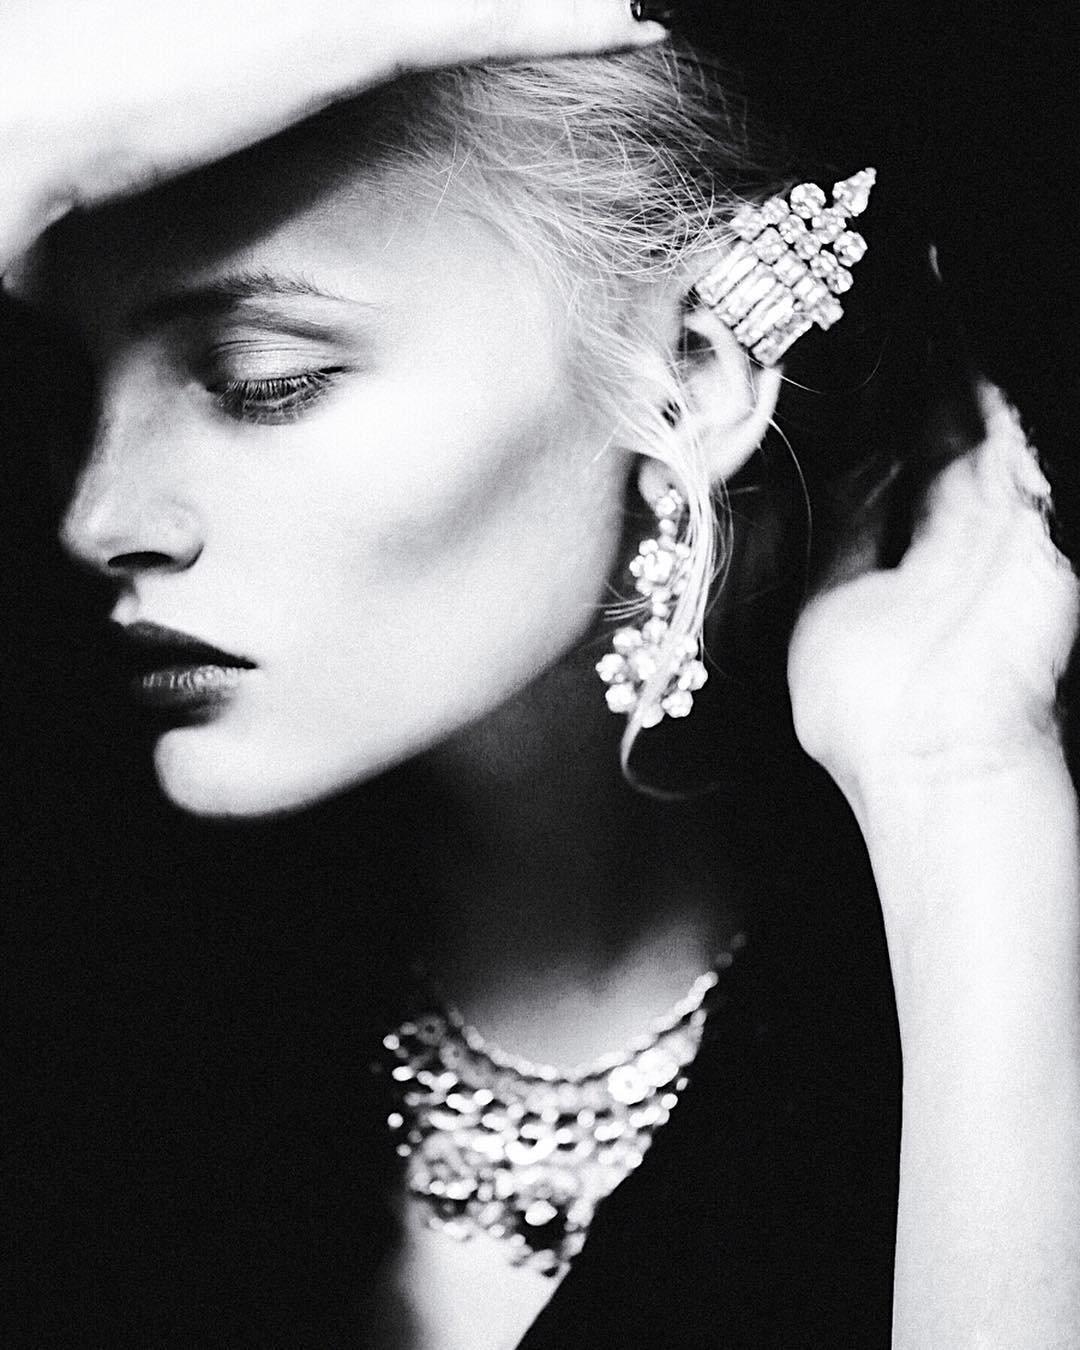 beautiful_black_and_white_portrait_photography_33.jpg